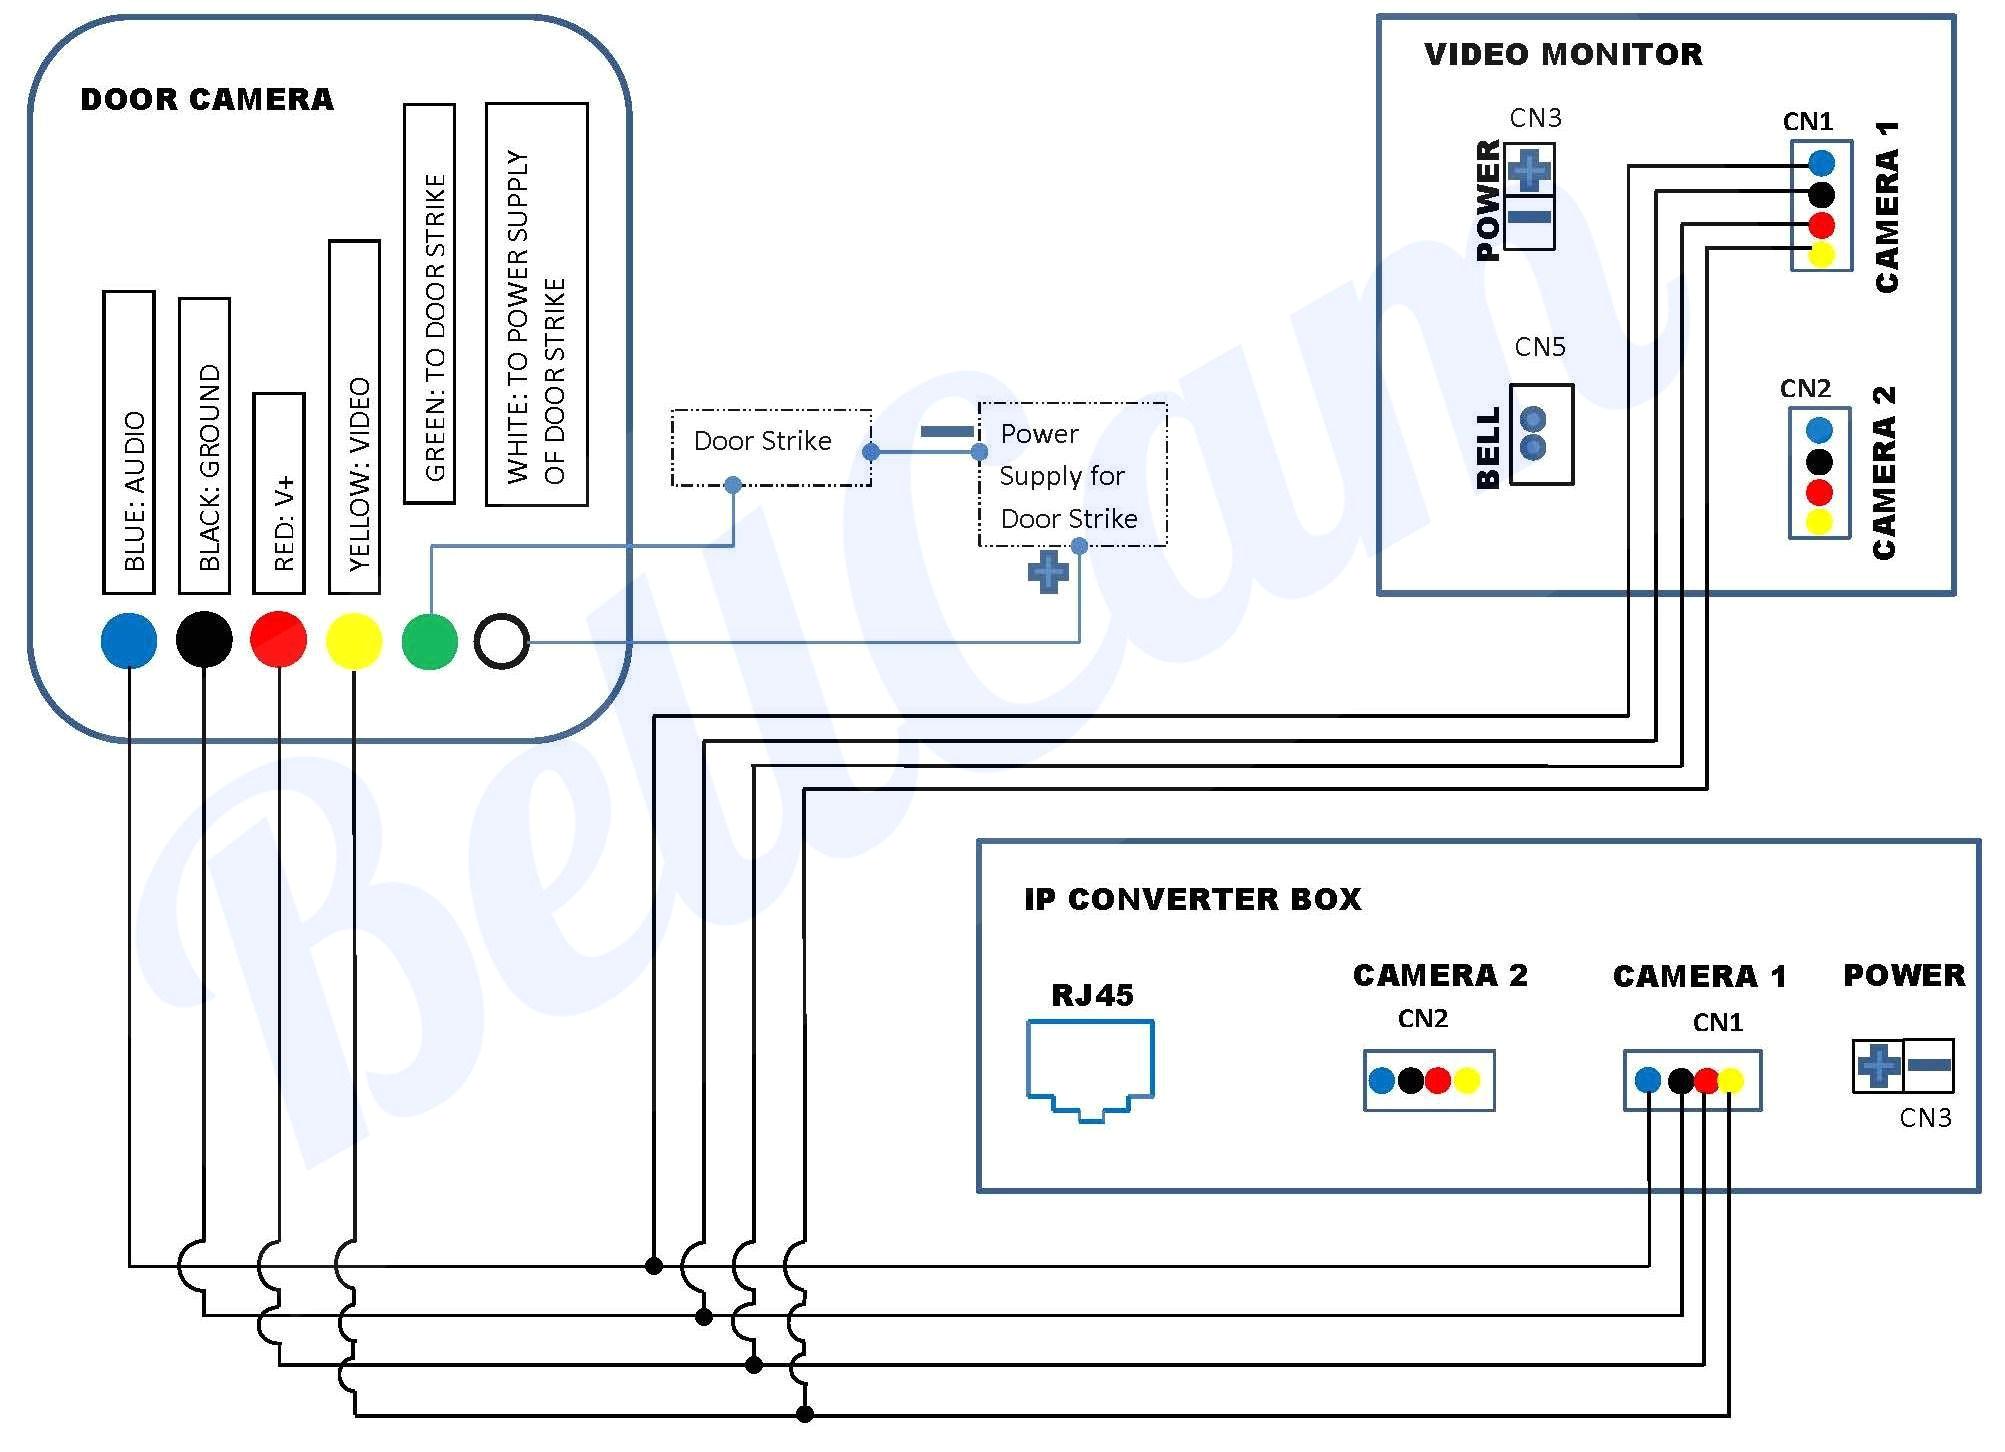 cat 5 wiring diagram camera security wiring diagram table cat 5 wiring diagram camera security wiring